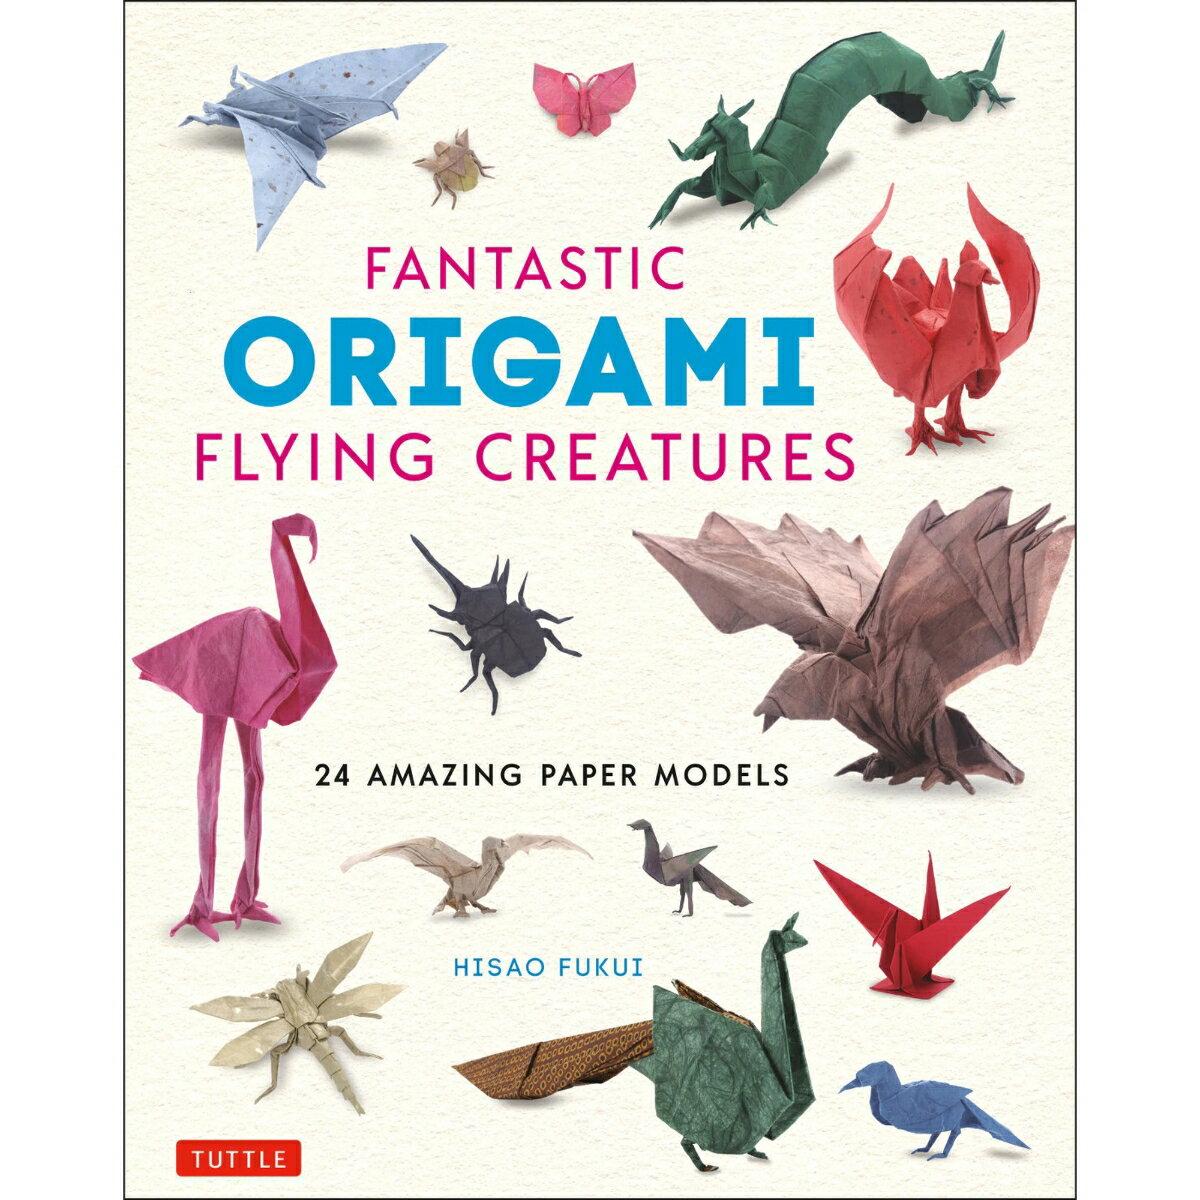 FANTASTIC ORIGAMI FLYING CREATURES画像